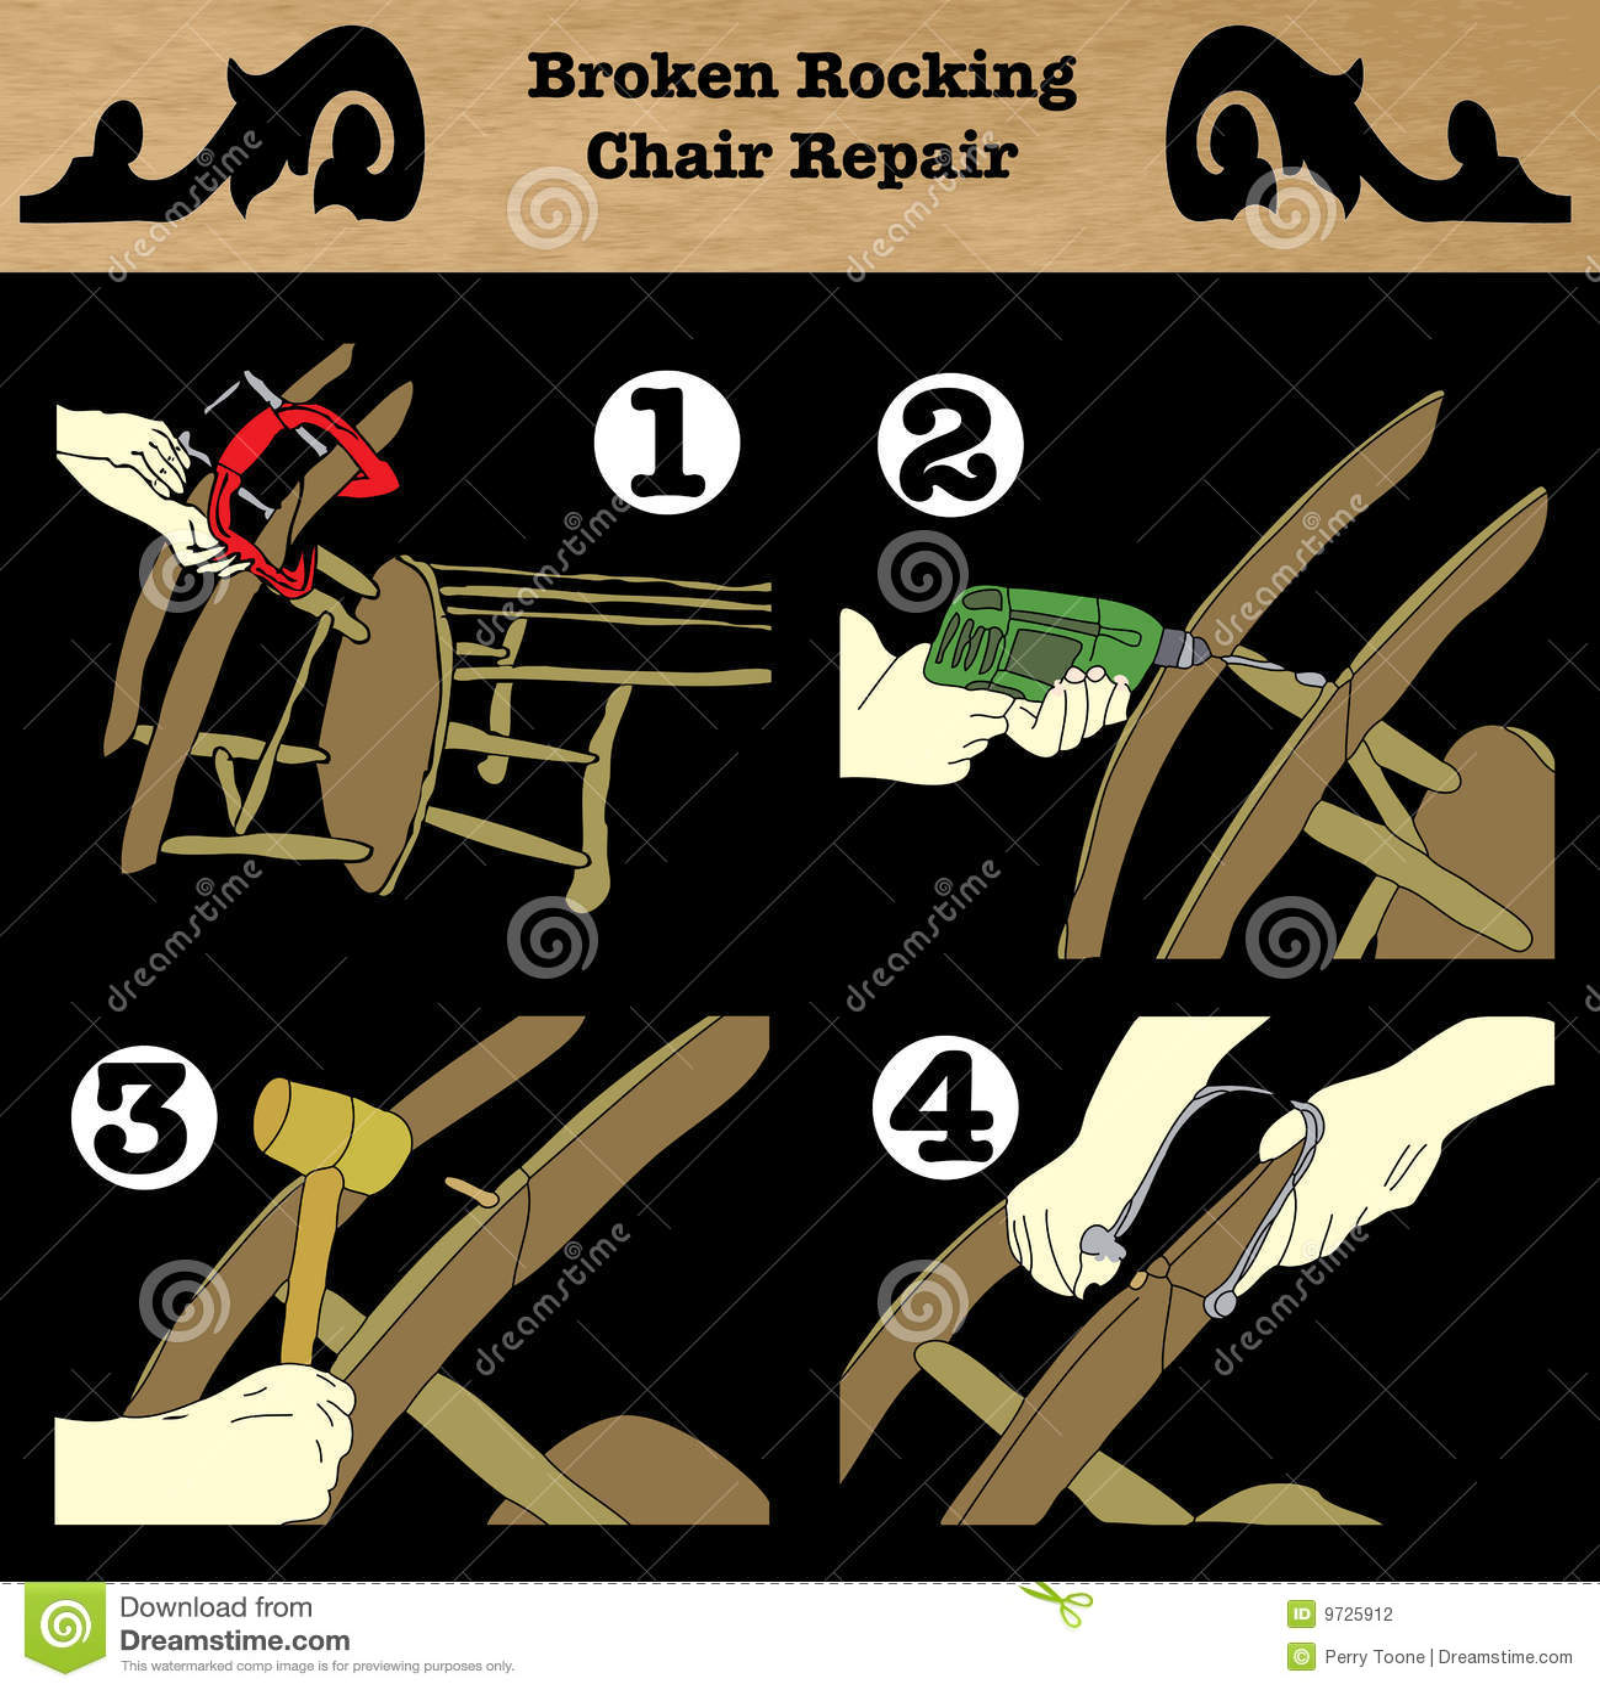 Broken Rocking Chair Repair Stock Illustration